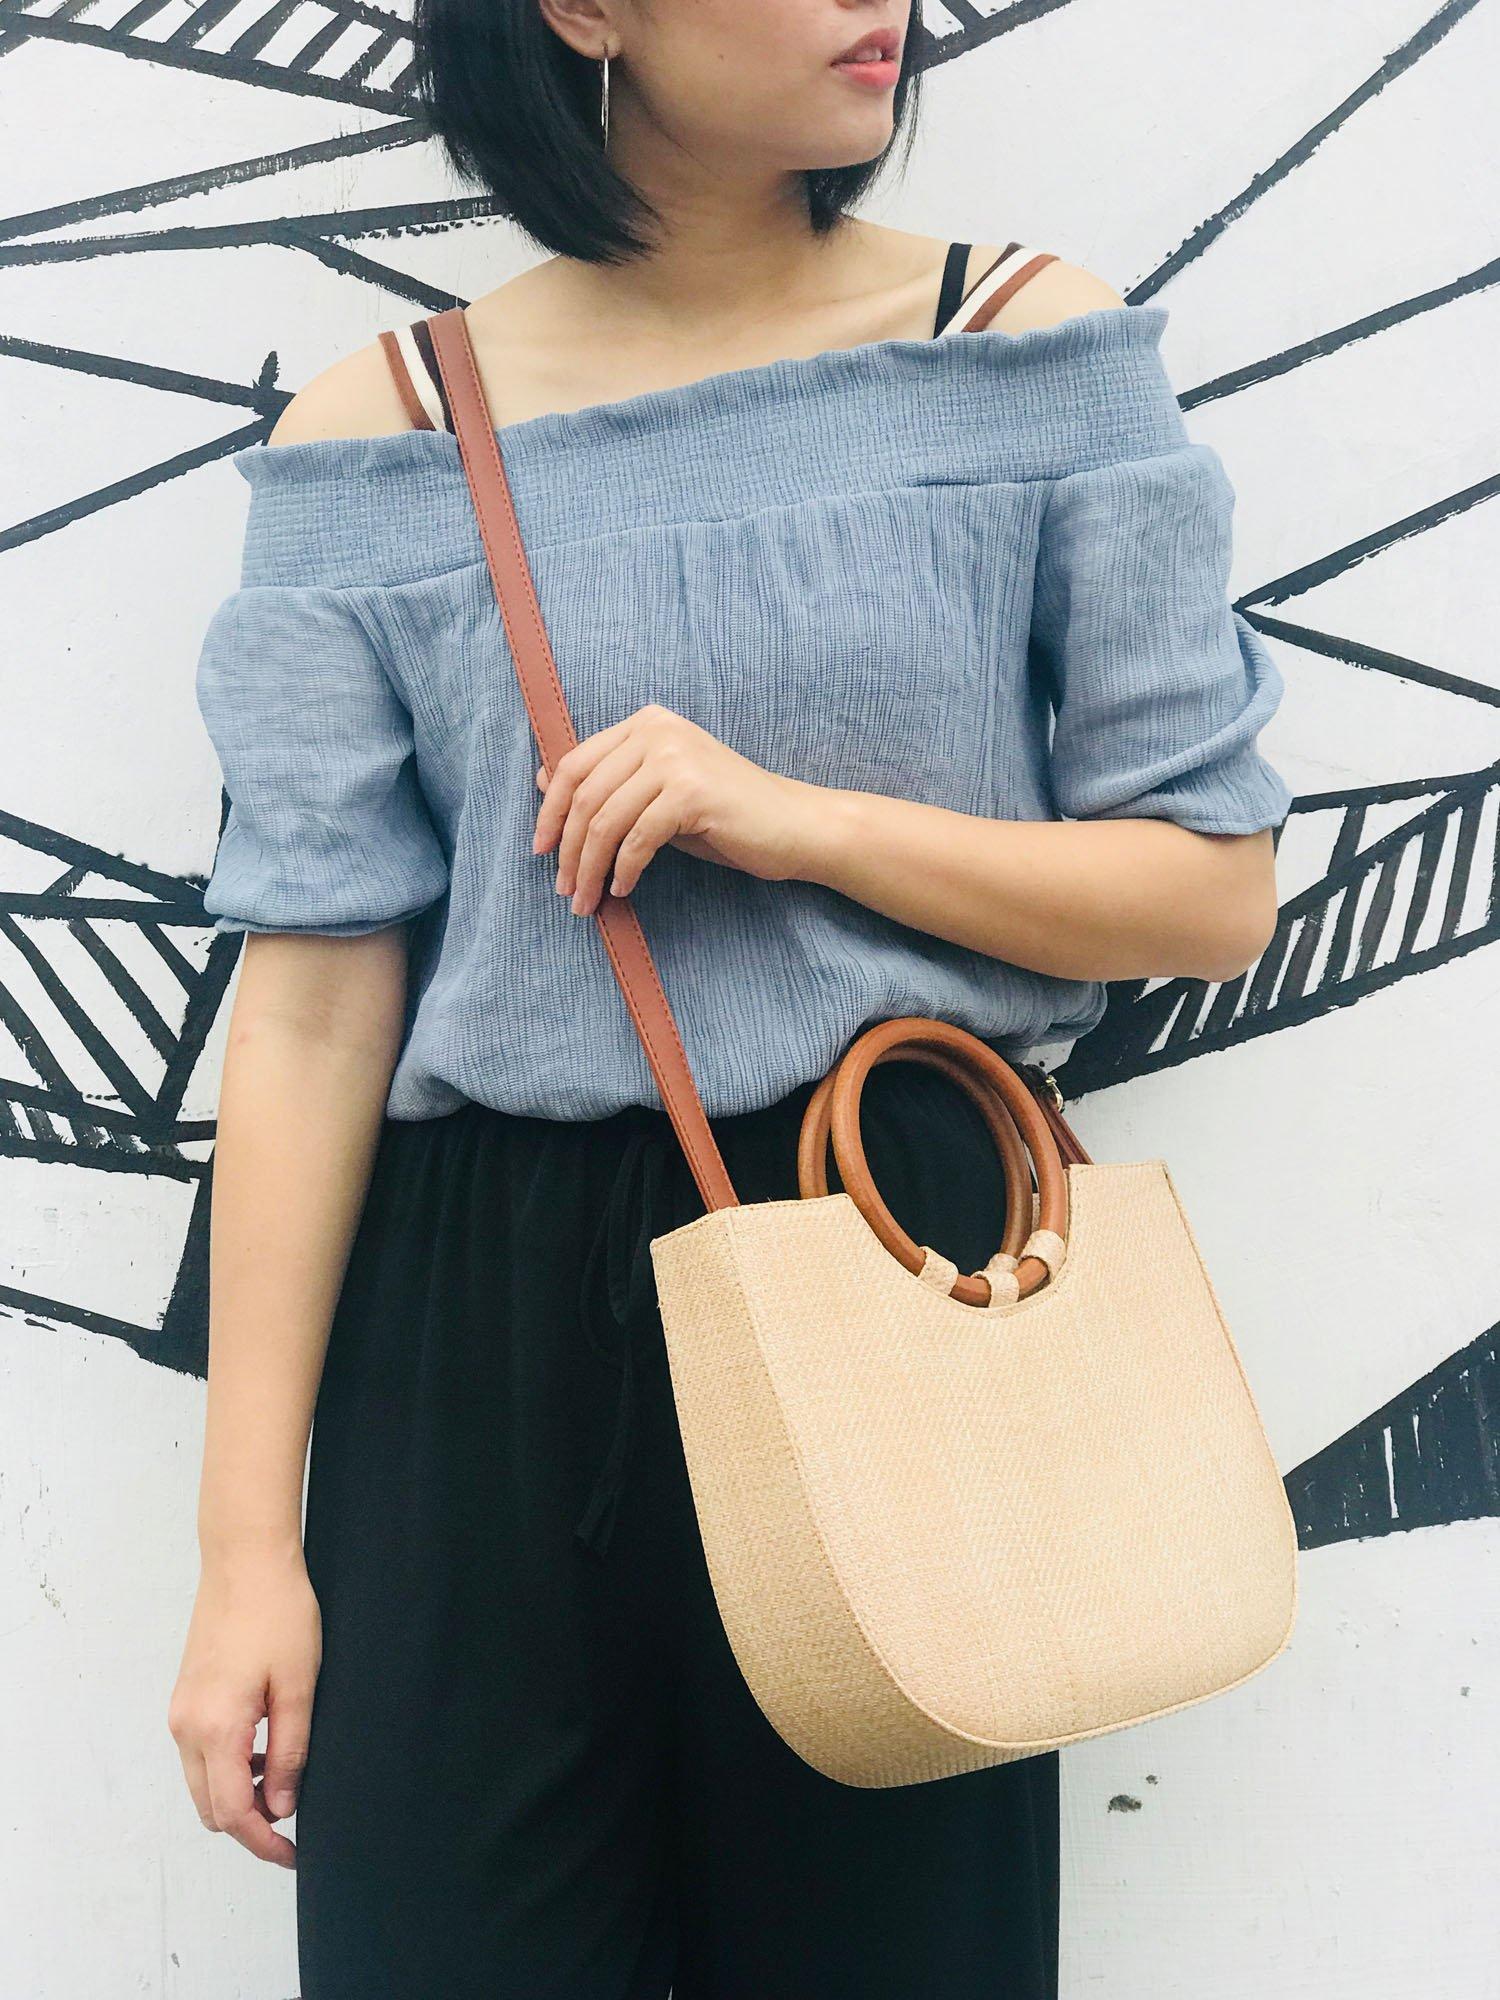 Youndcc Women Woven Straw Bag Rattan Bag Tote Bag Shoulder Bag Crossbody Bag Handbag Beach Bag, Handwoven/Crochet/Round Handle by Youndcc (Image #5)